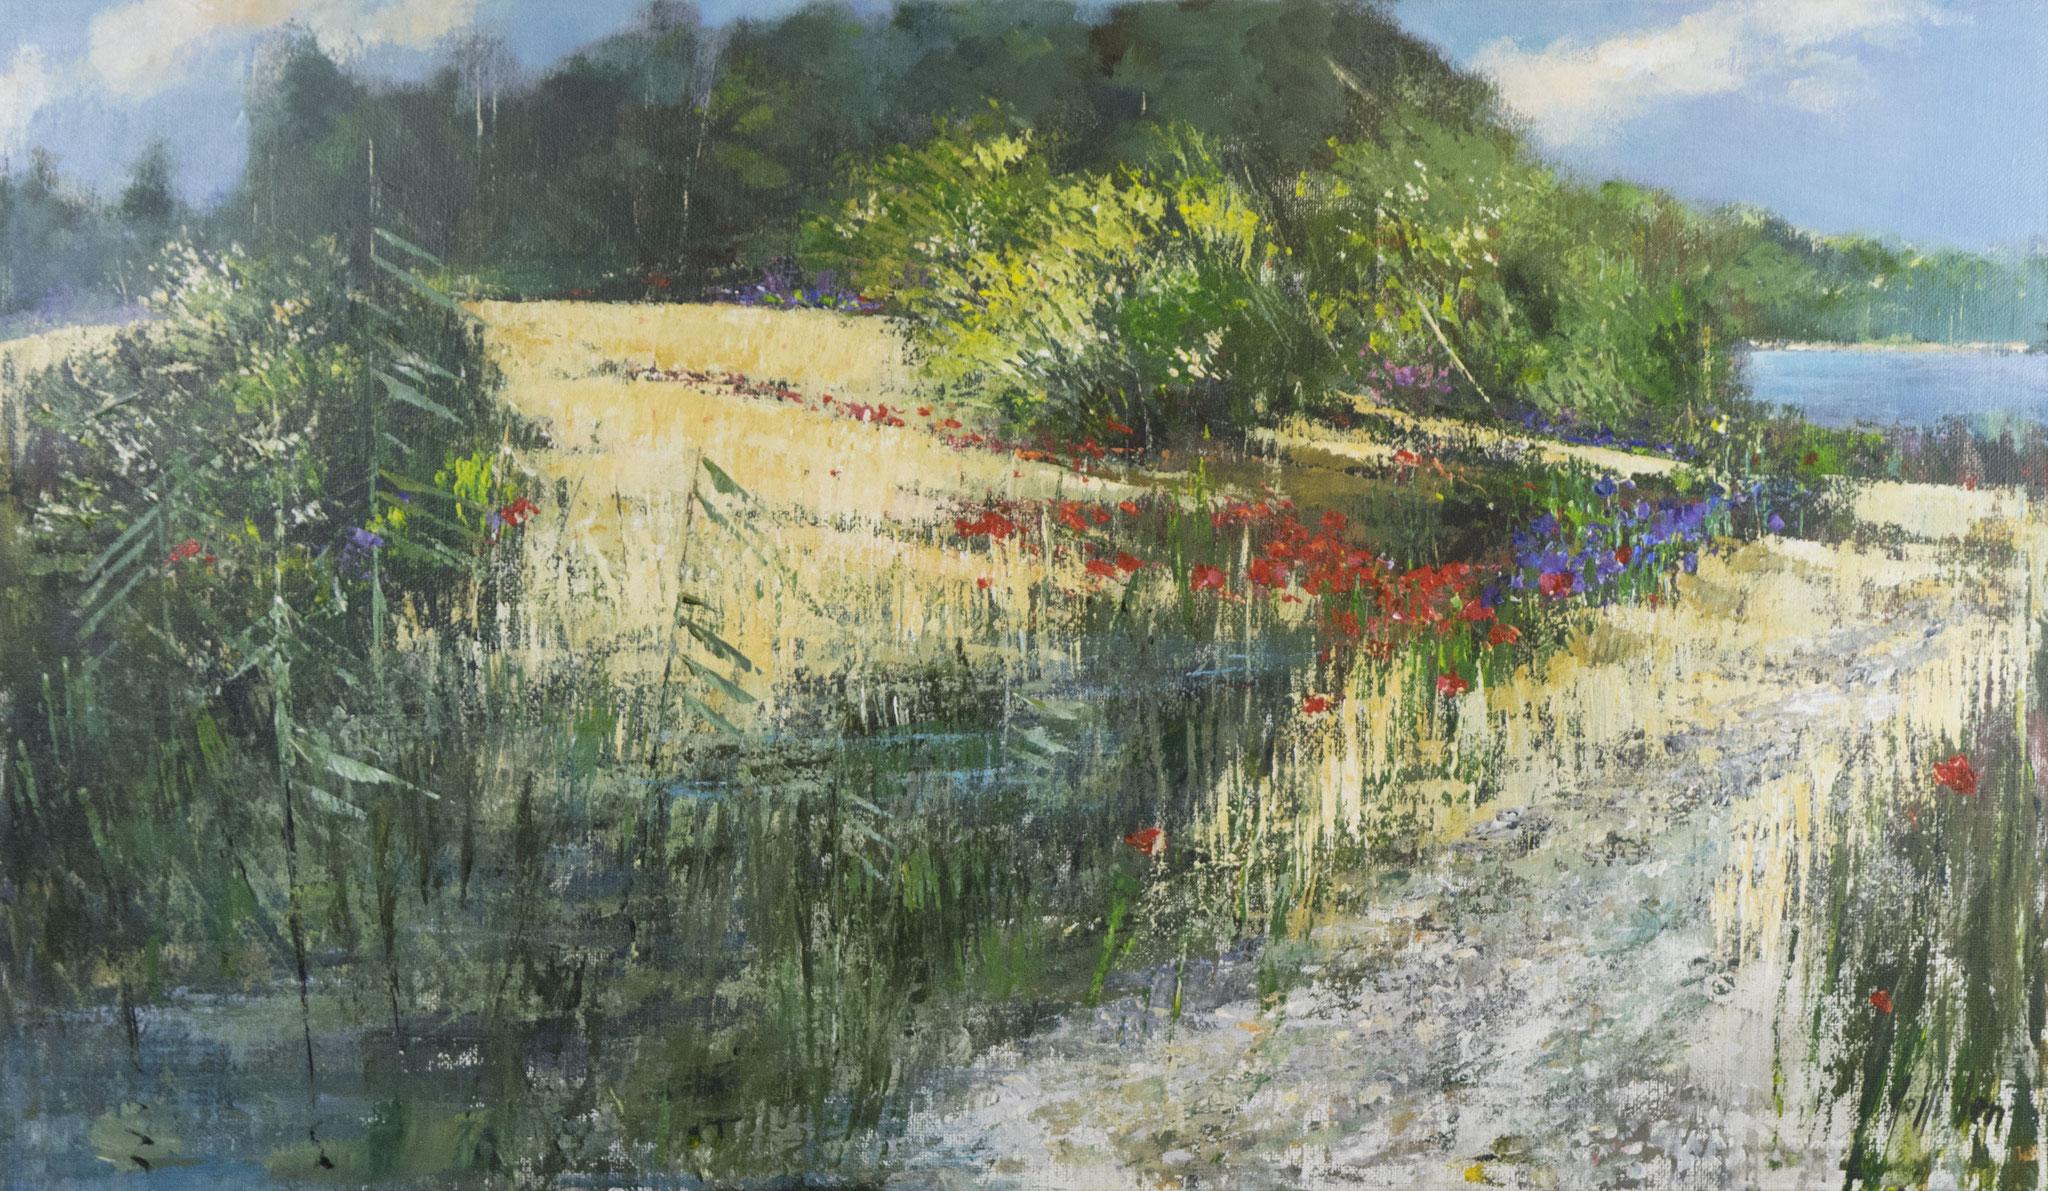 """Lo stagno fiorita"" - Öl auf Leinwand - 120x70 cm"